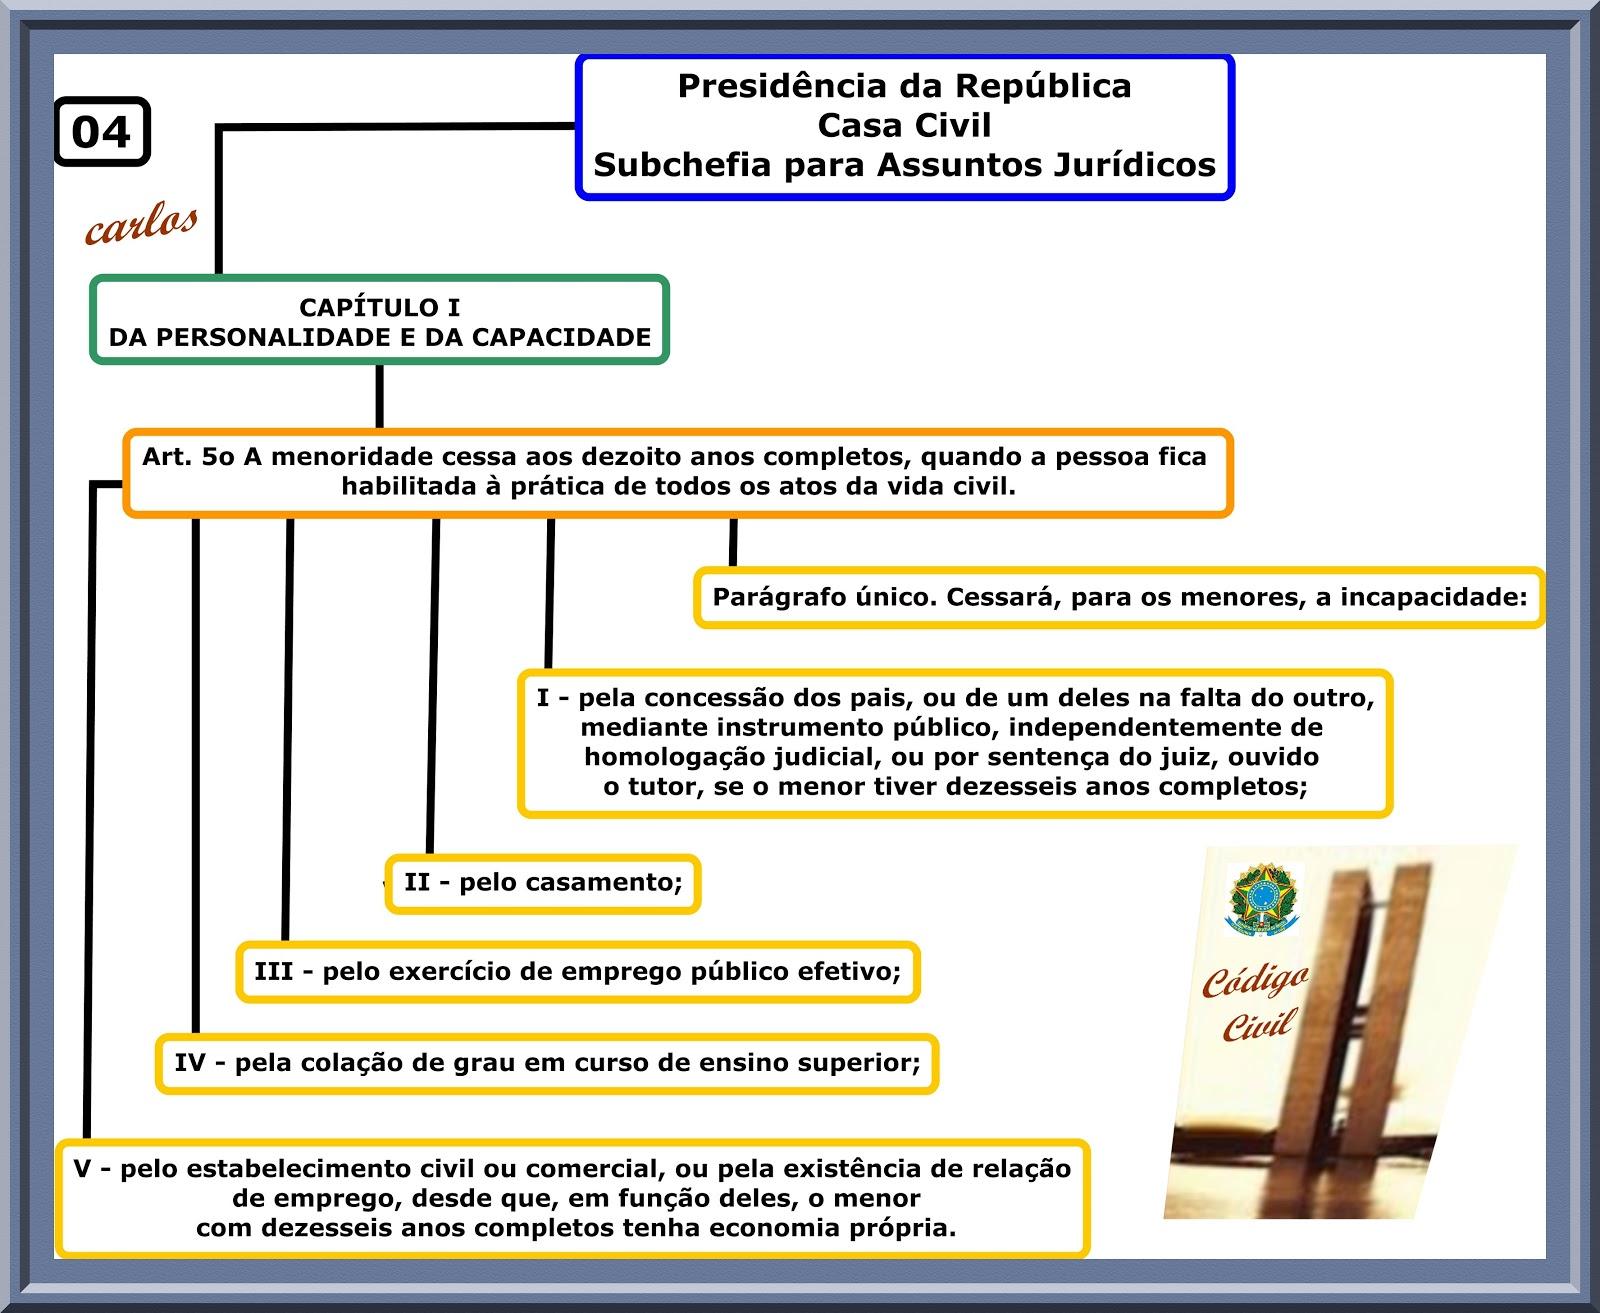 Código Civil - CAPÍTULO I DA PERSONALIDADE E DA CAPACIDADE